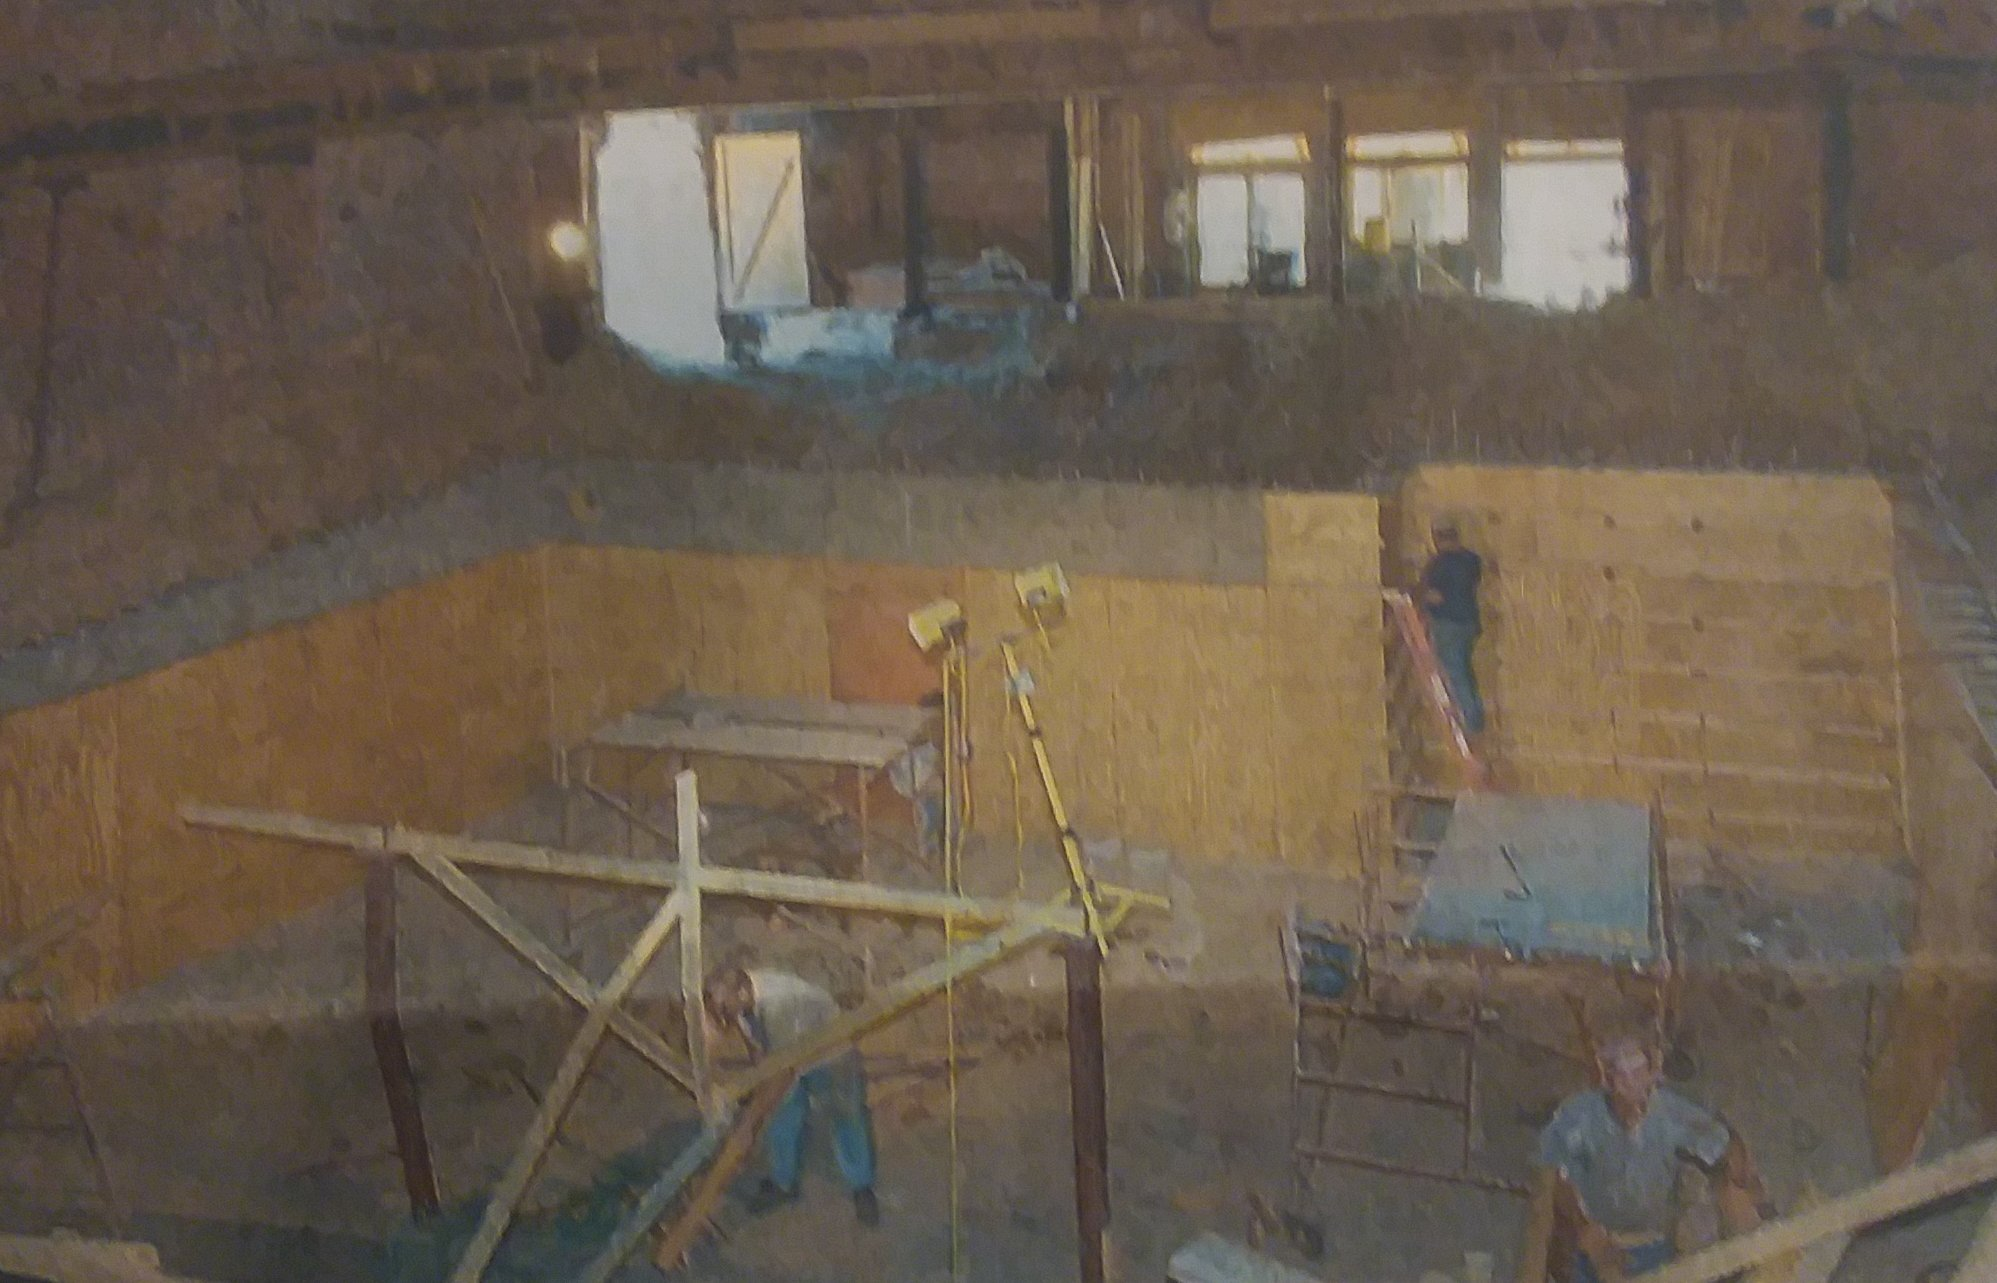 Athens restoration project 2001 (source: DeLand News-Journal)